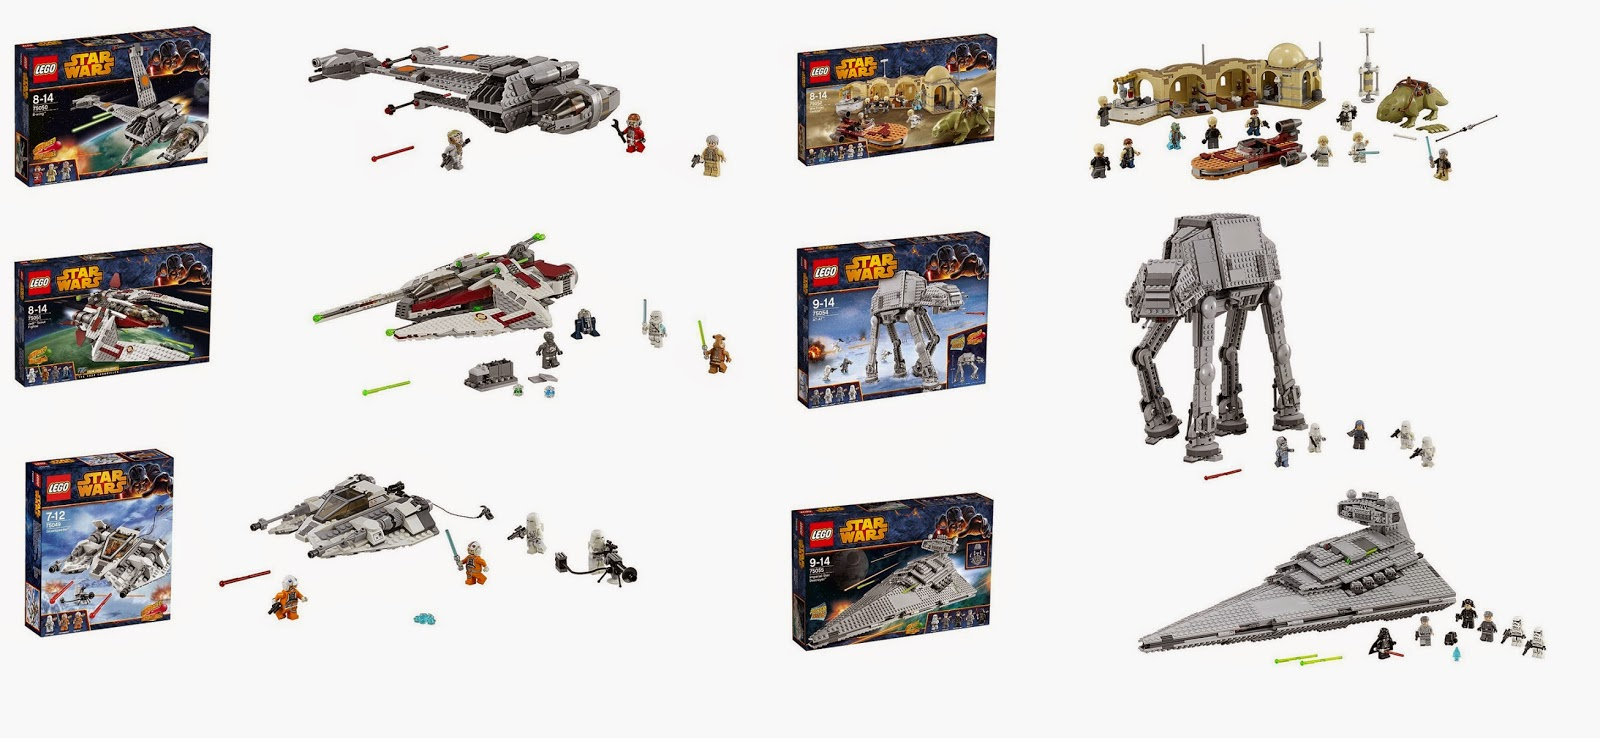 Lego Star Wars - MojeKlocki24.pl